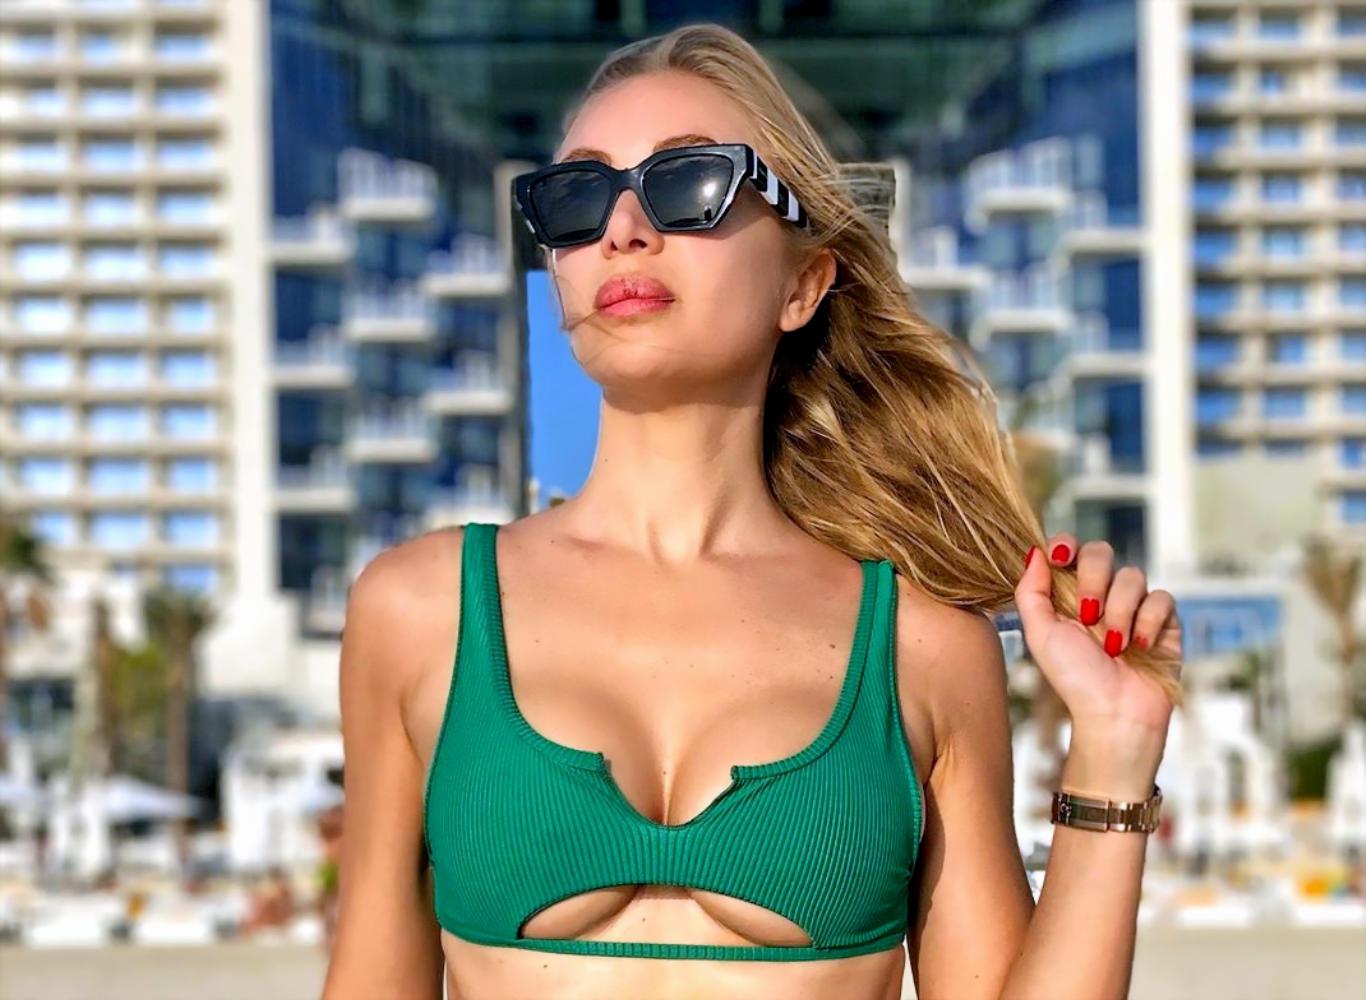 Laura Cremaschi Green Bikini Wallpaper